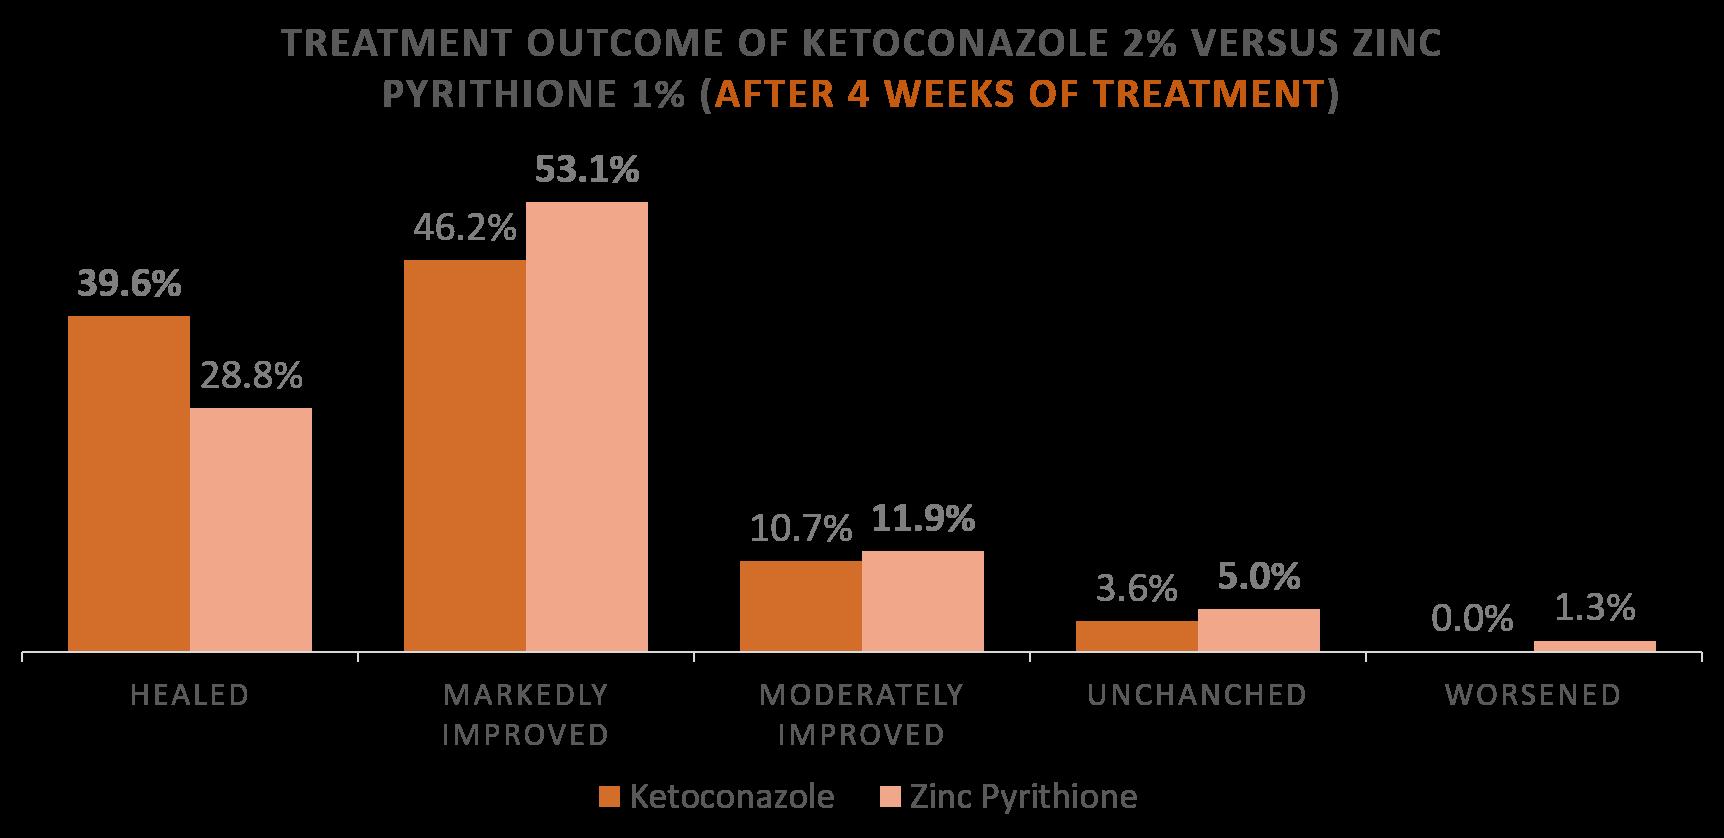 Ketoconazole versus Zinc Pyrithione for Seborrheic Dermatitis